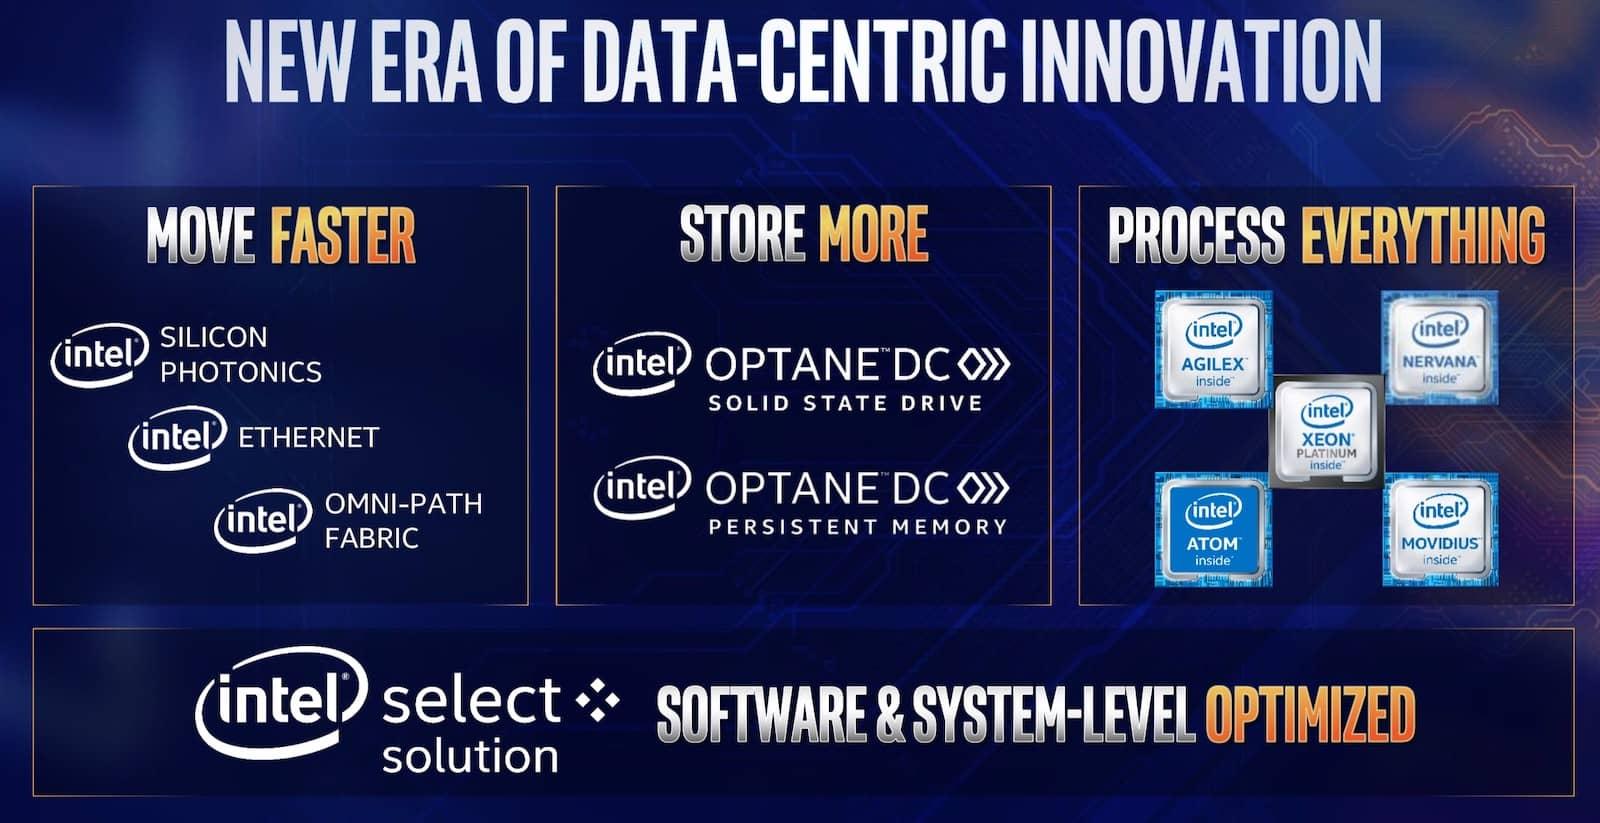 data-centric-new-era.jpg